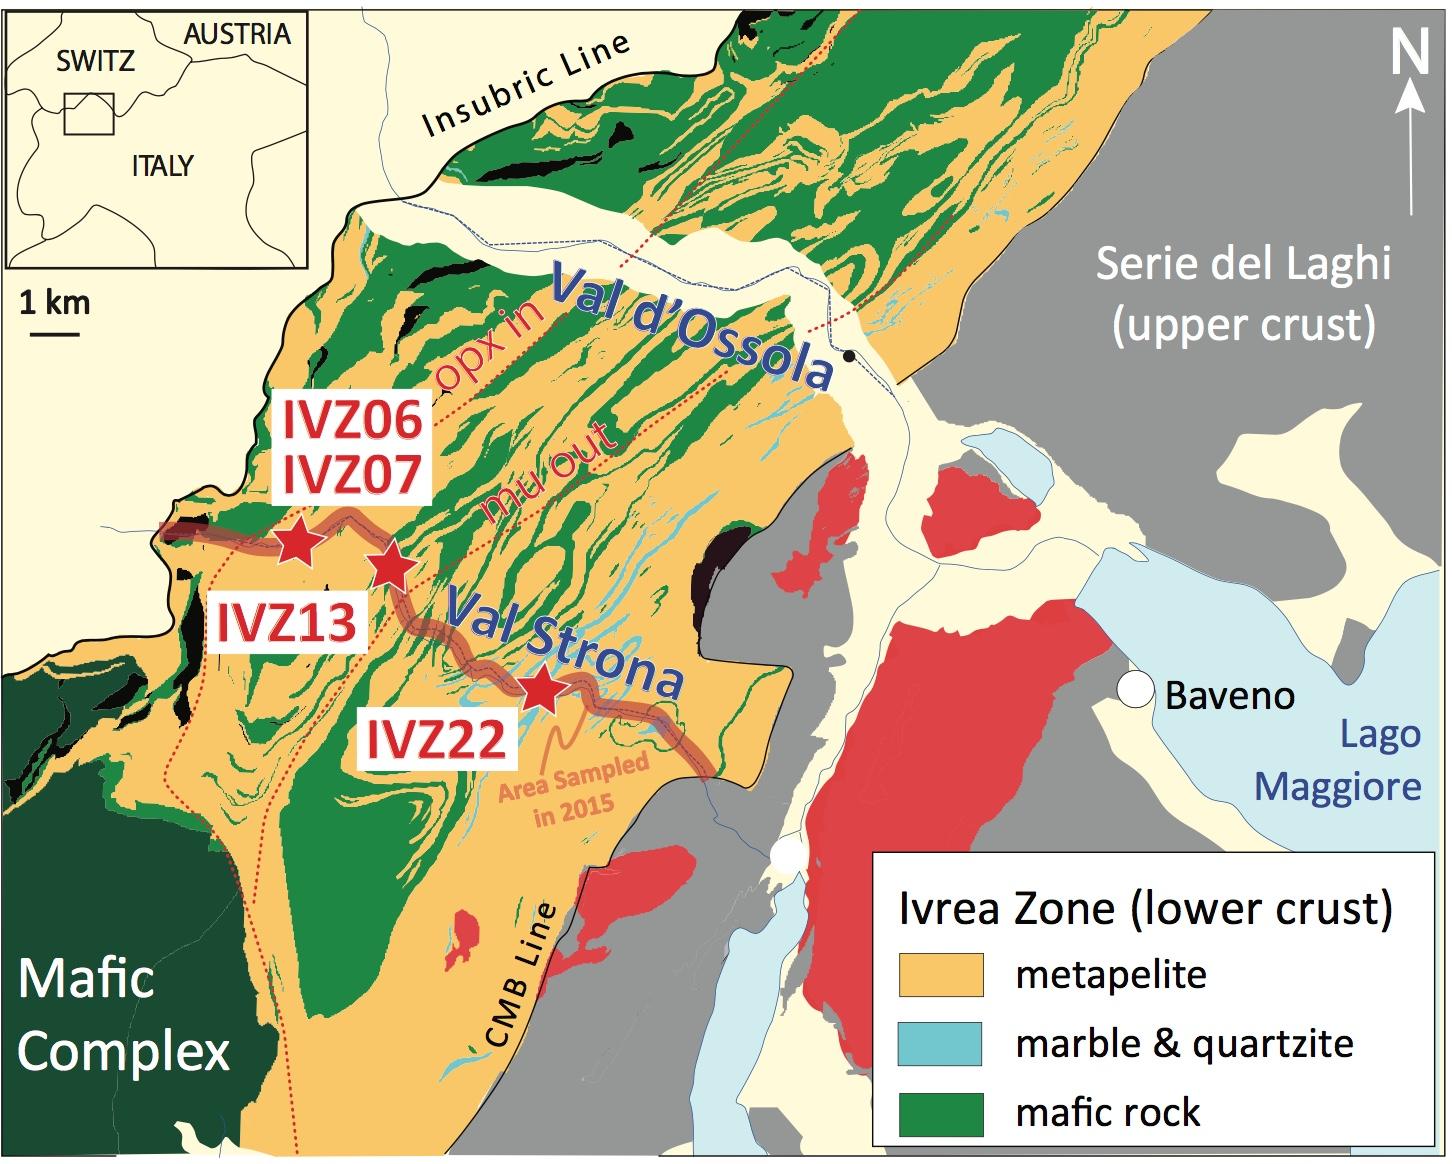 Geological map of the Ivrea-Verbano Zone (after Brack et al 2010)